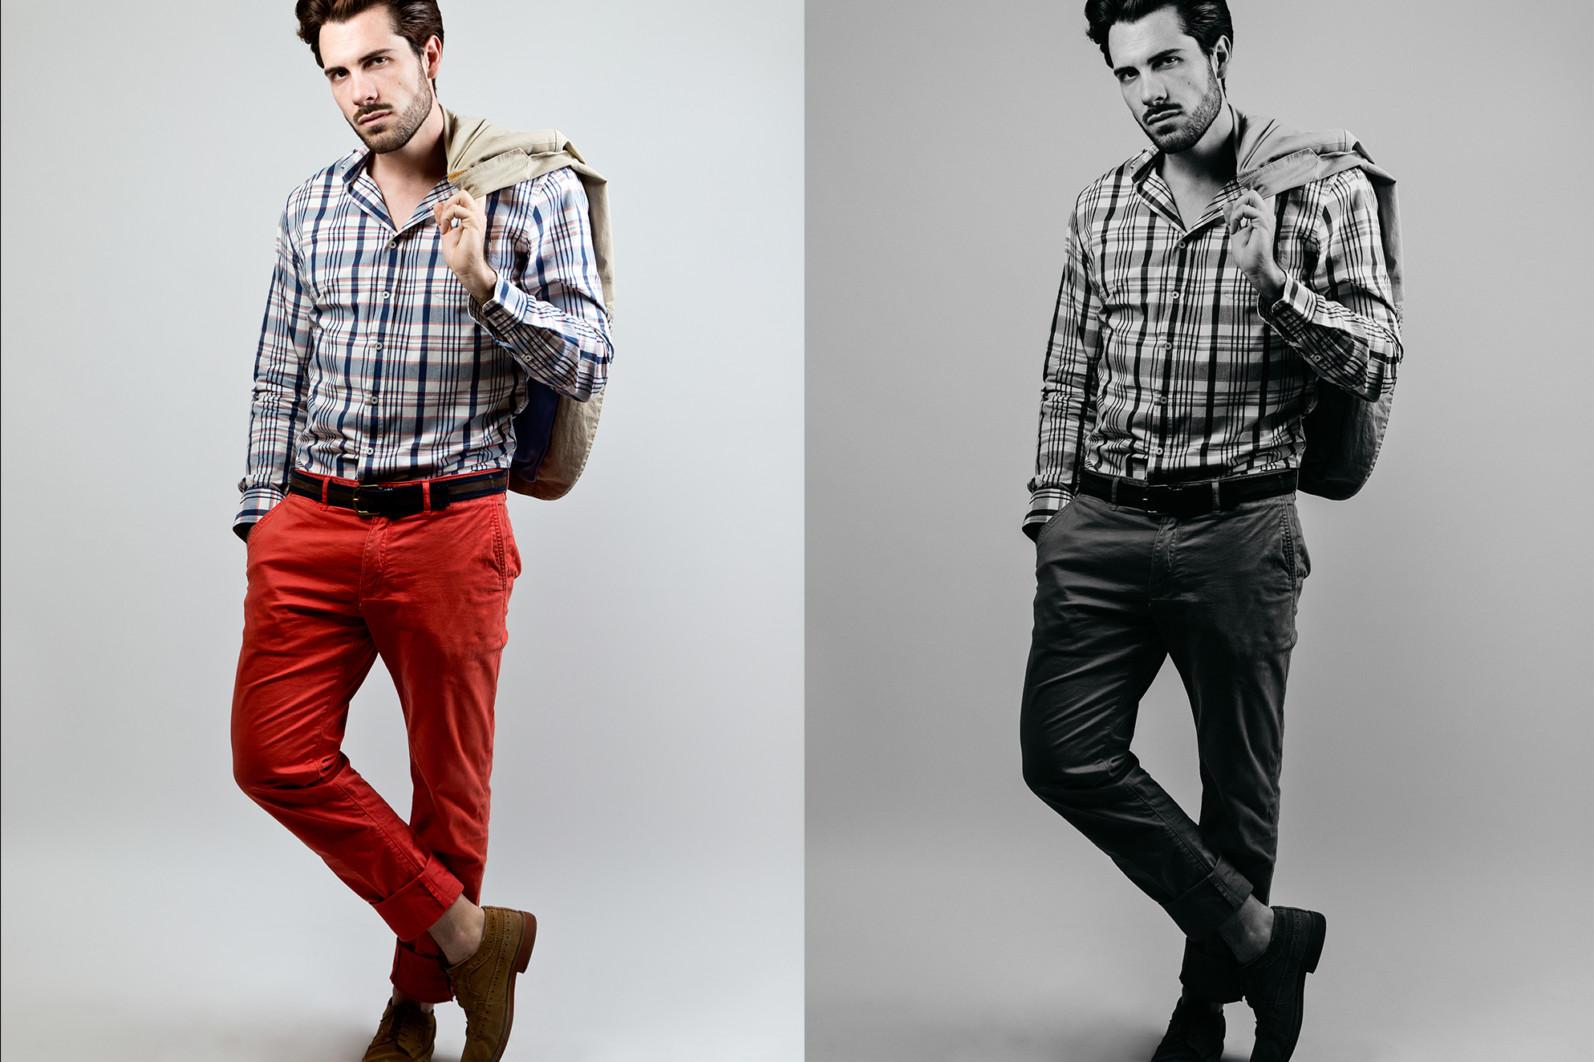 15 x Lightroom Presets, Monochrome Men Presets, Black and White Presets, Portrait Presets - 1 Monochrome Men 1 -